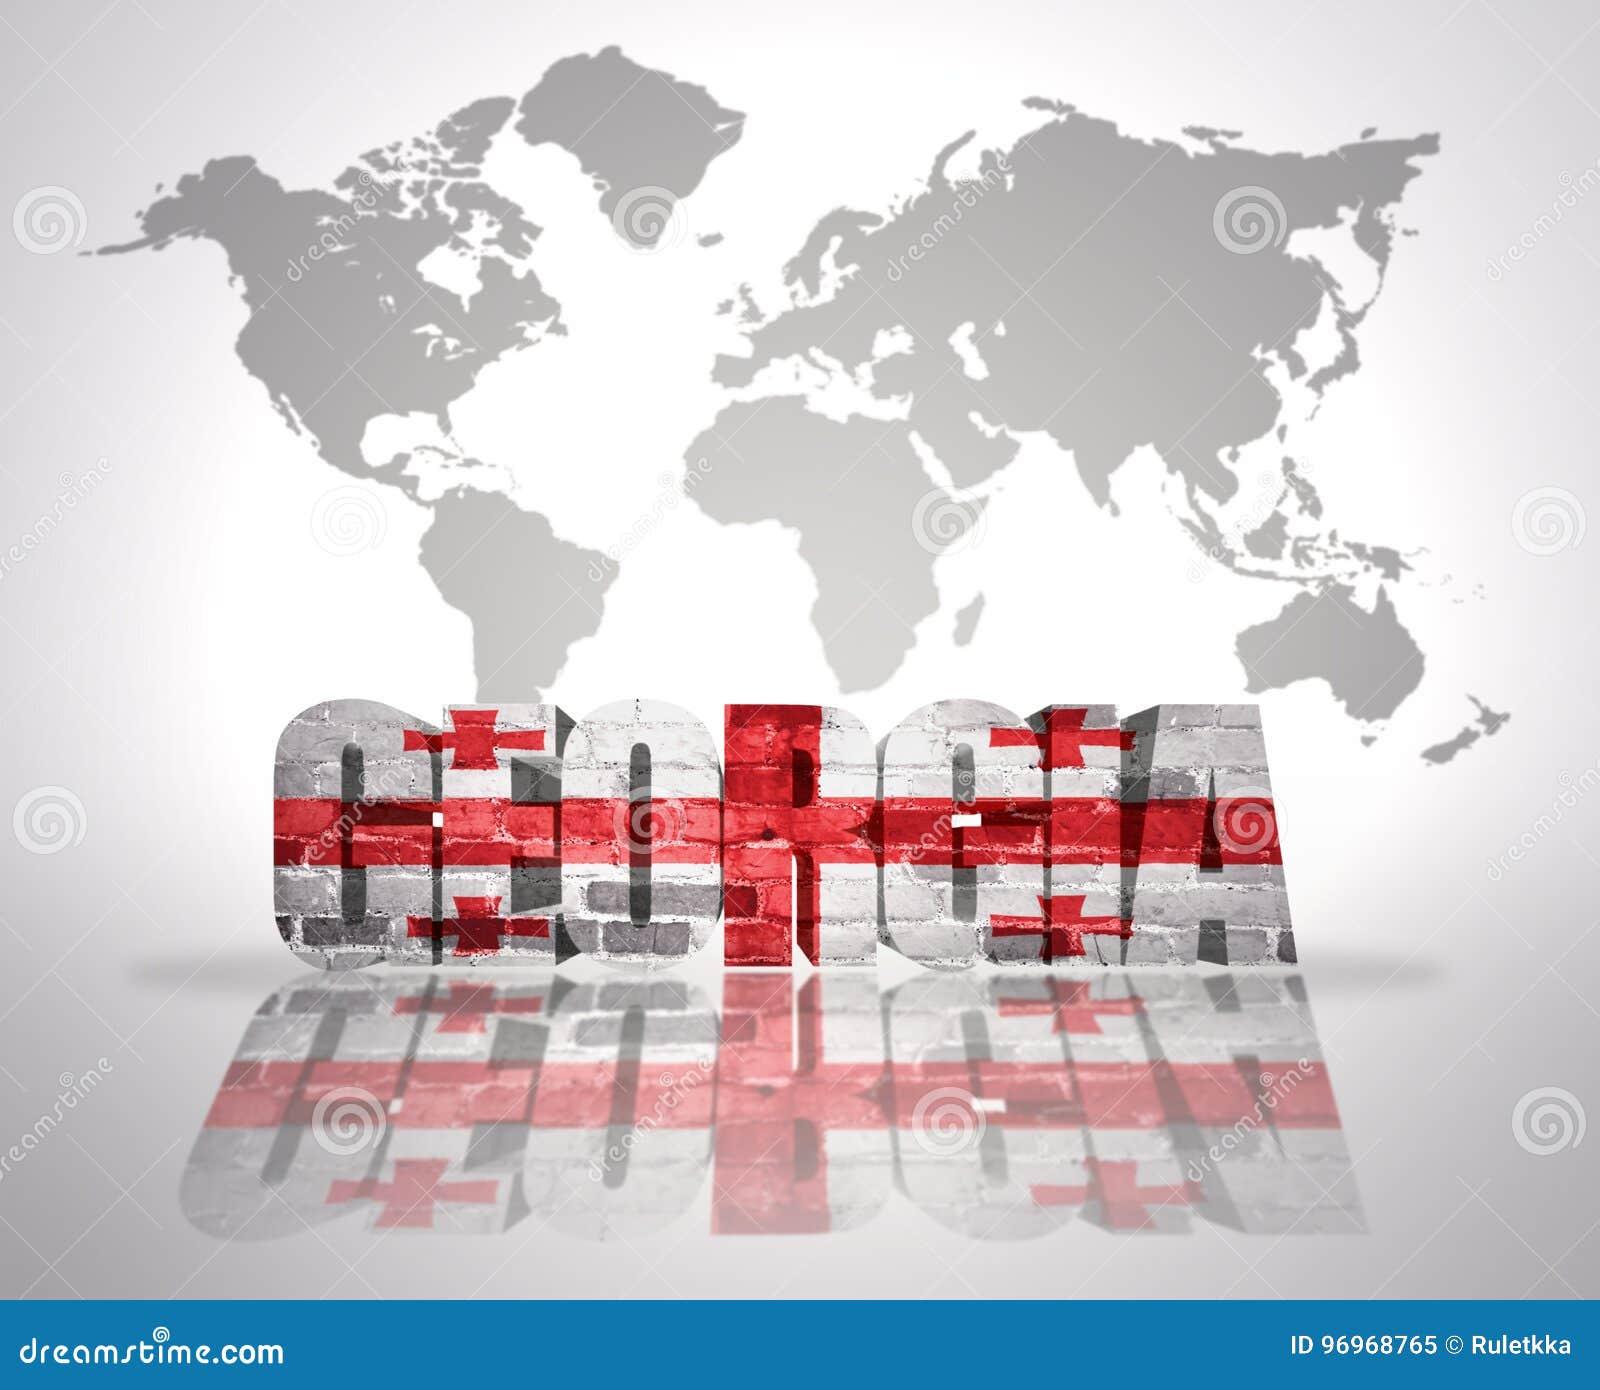 Word Georgia On A World Map Background Stock Illustration